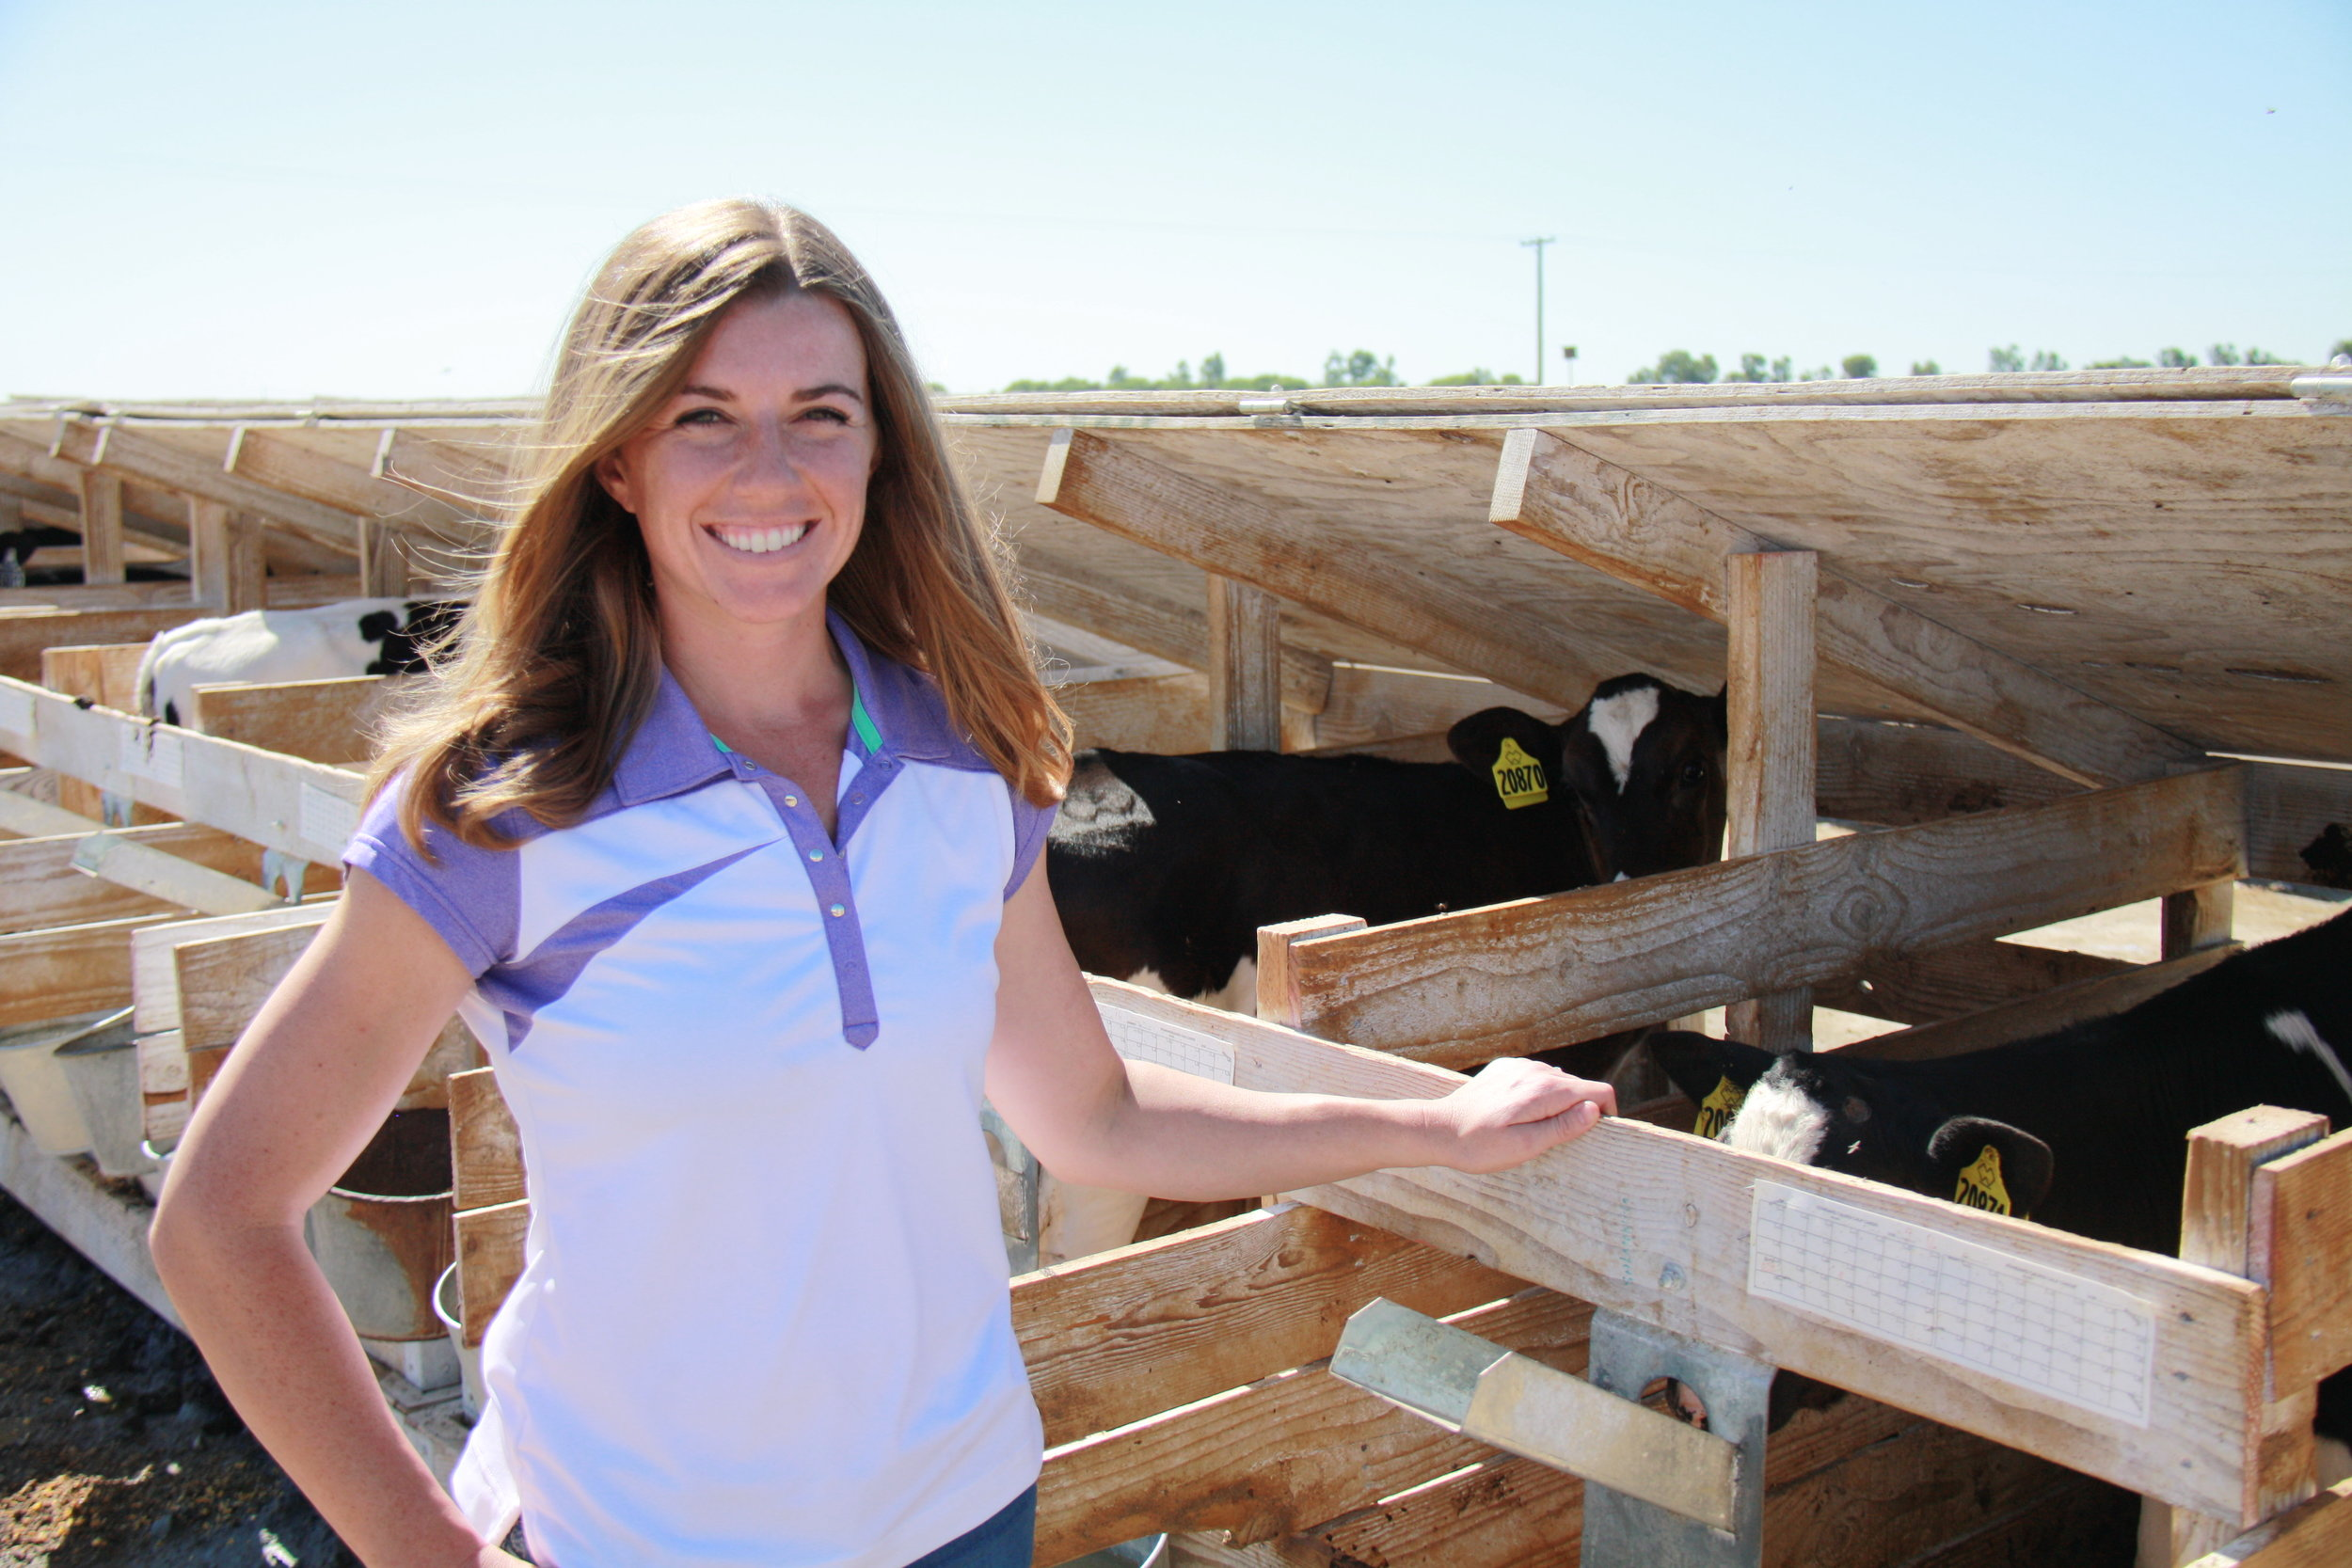 - Accredited Veterinarian in California & TexasNational Dairy FARM Program EvaluatorCertified Low Energy Animal Handling (LEAH) Instructor